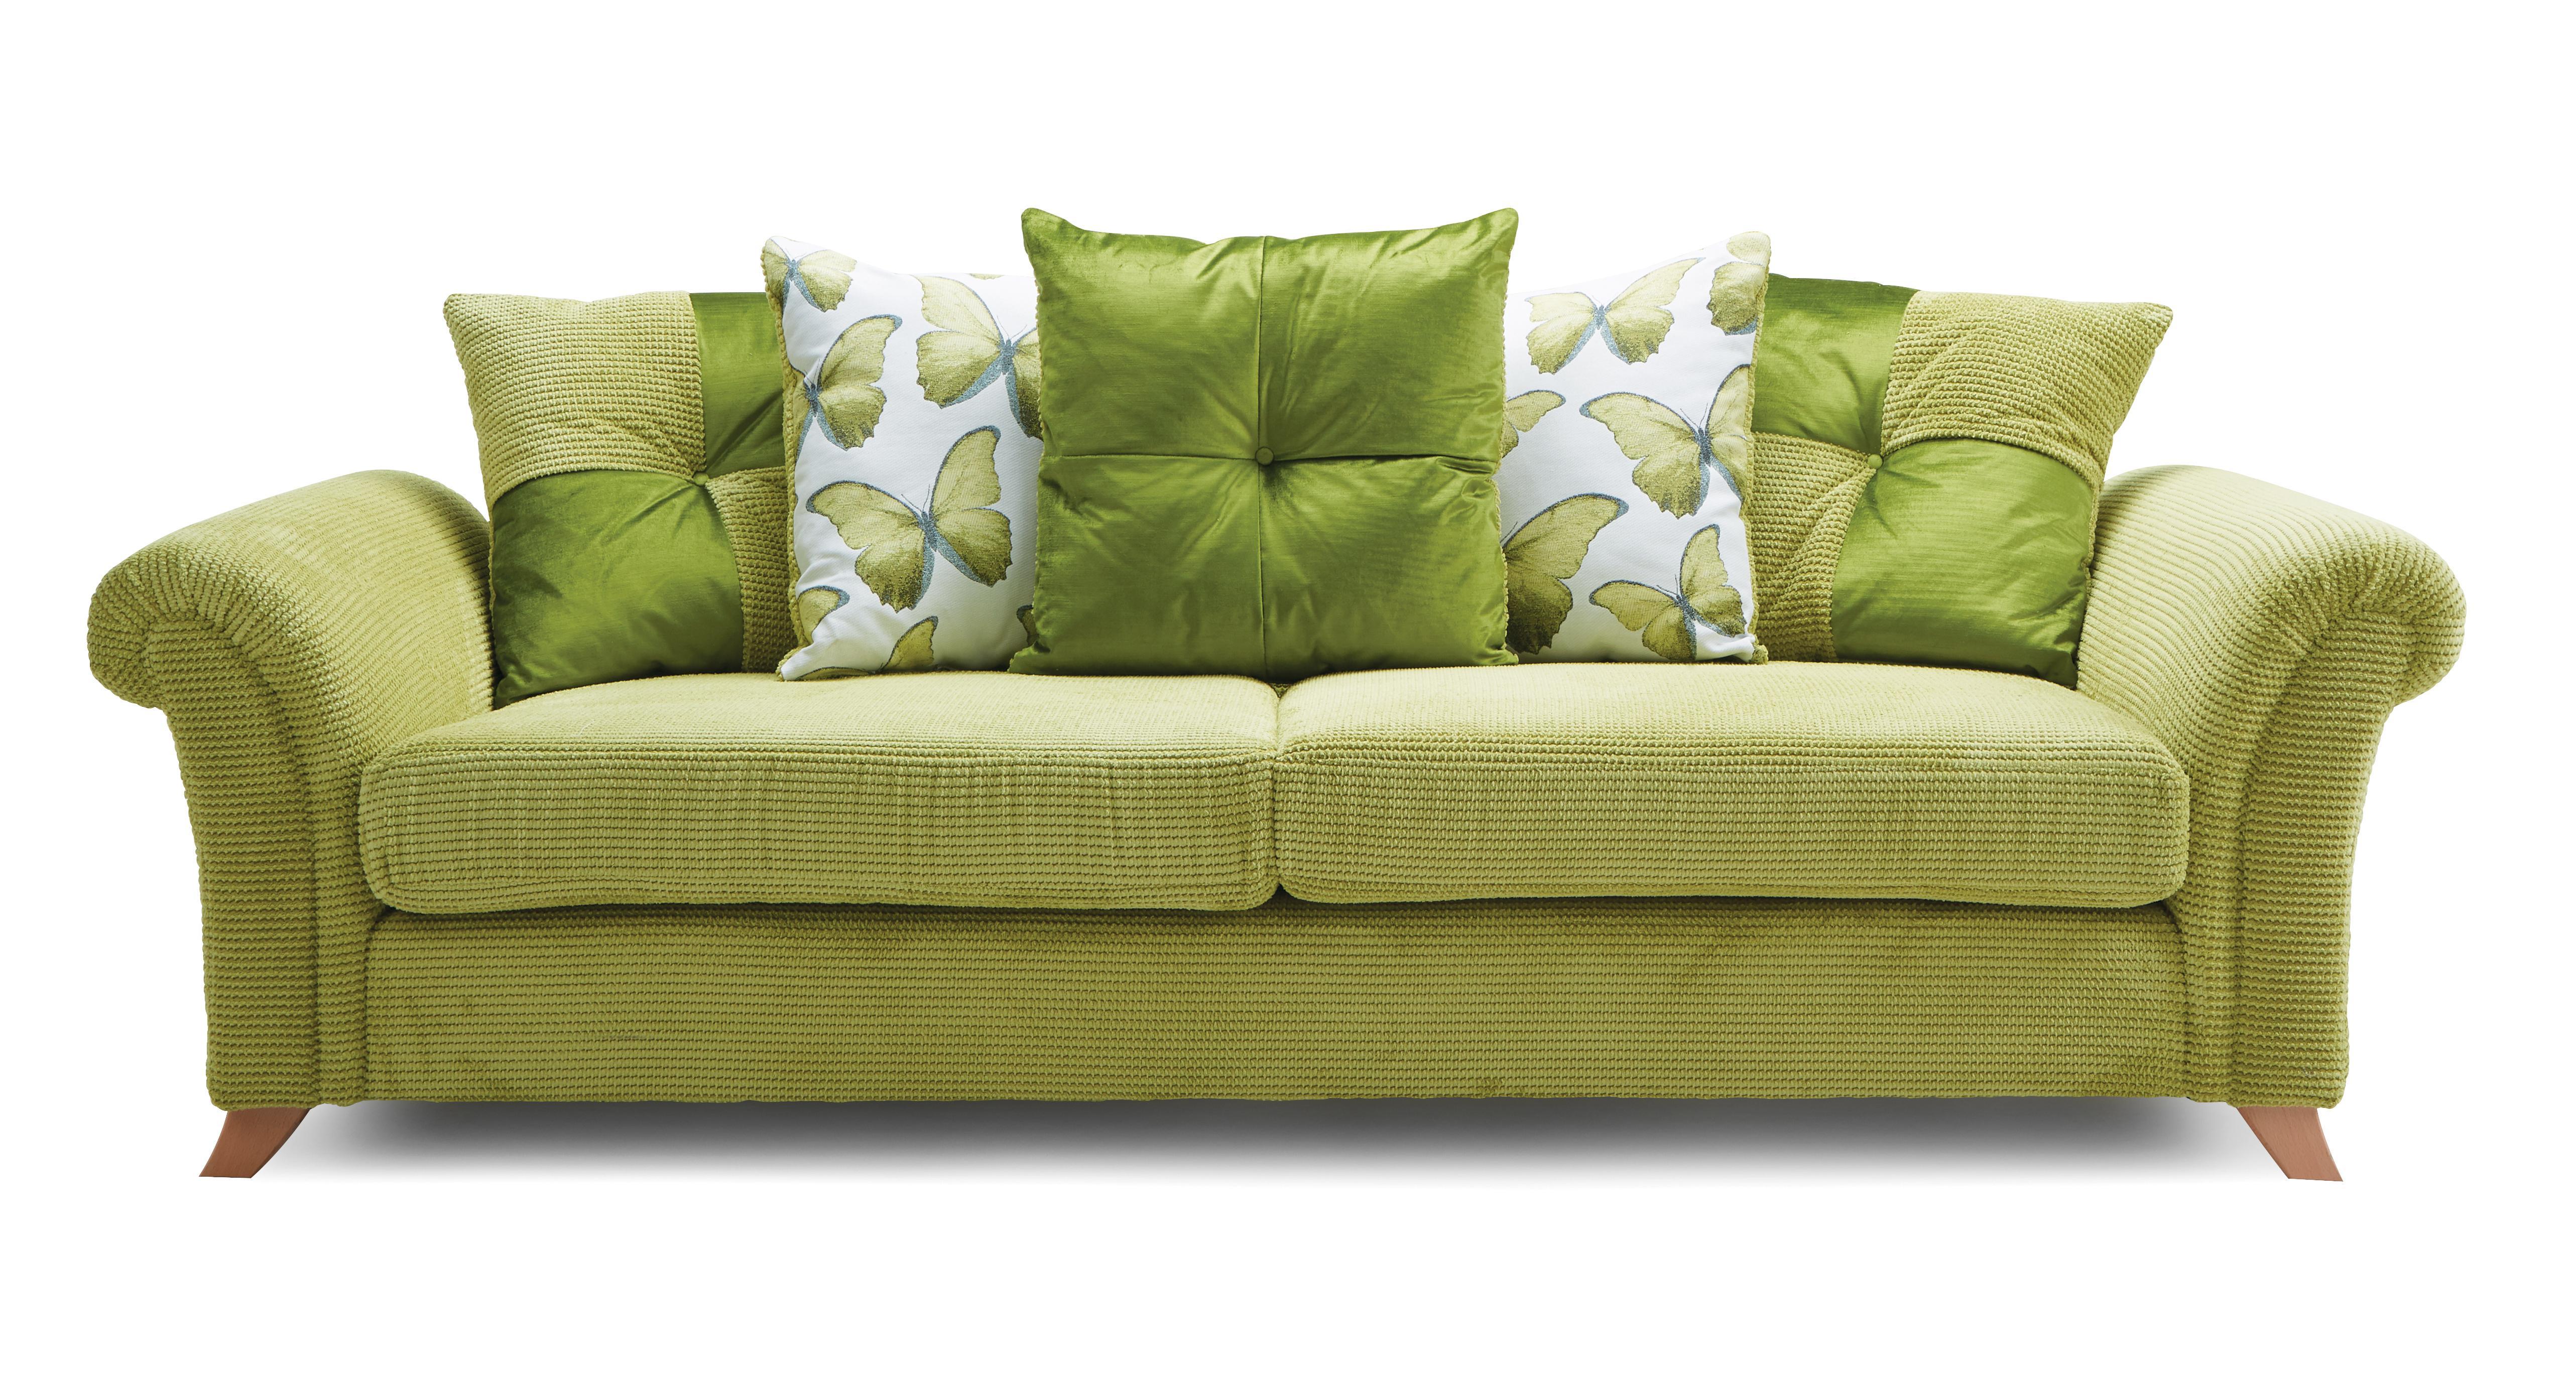 Arica Pillow Back 4 Seater Sofa Dfs Ireland